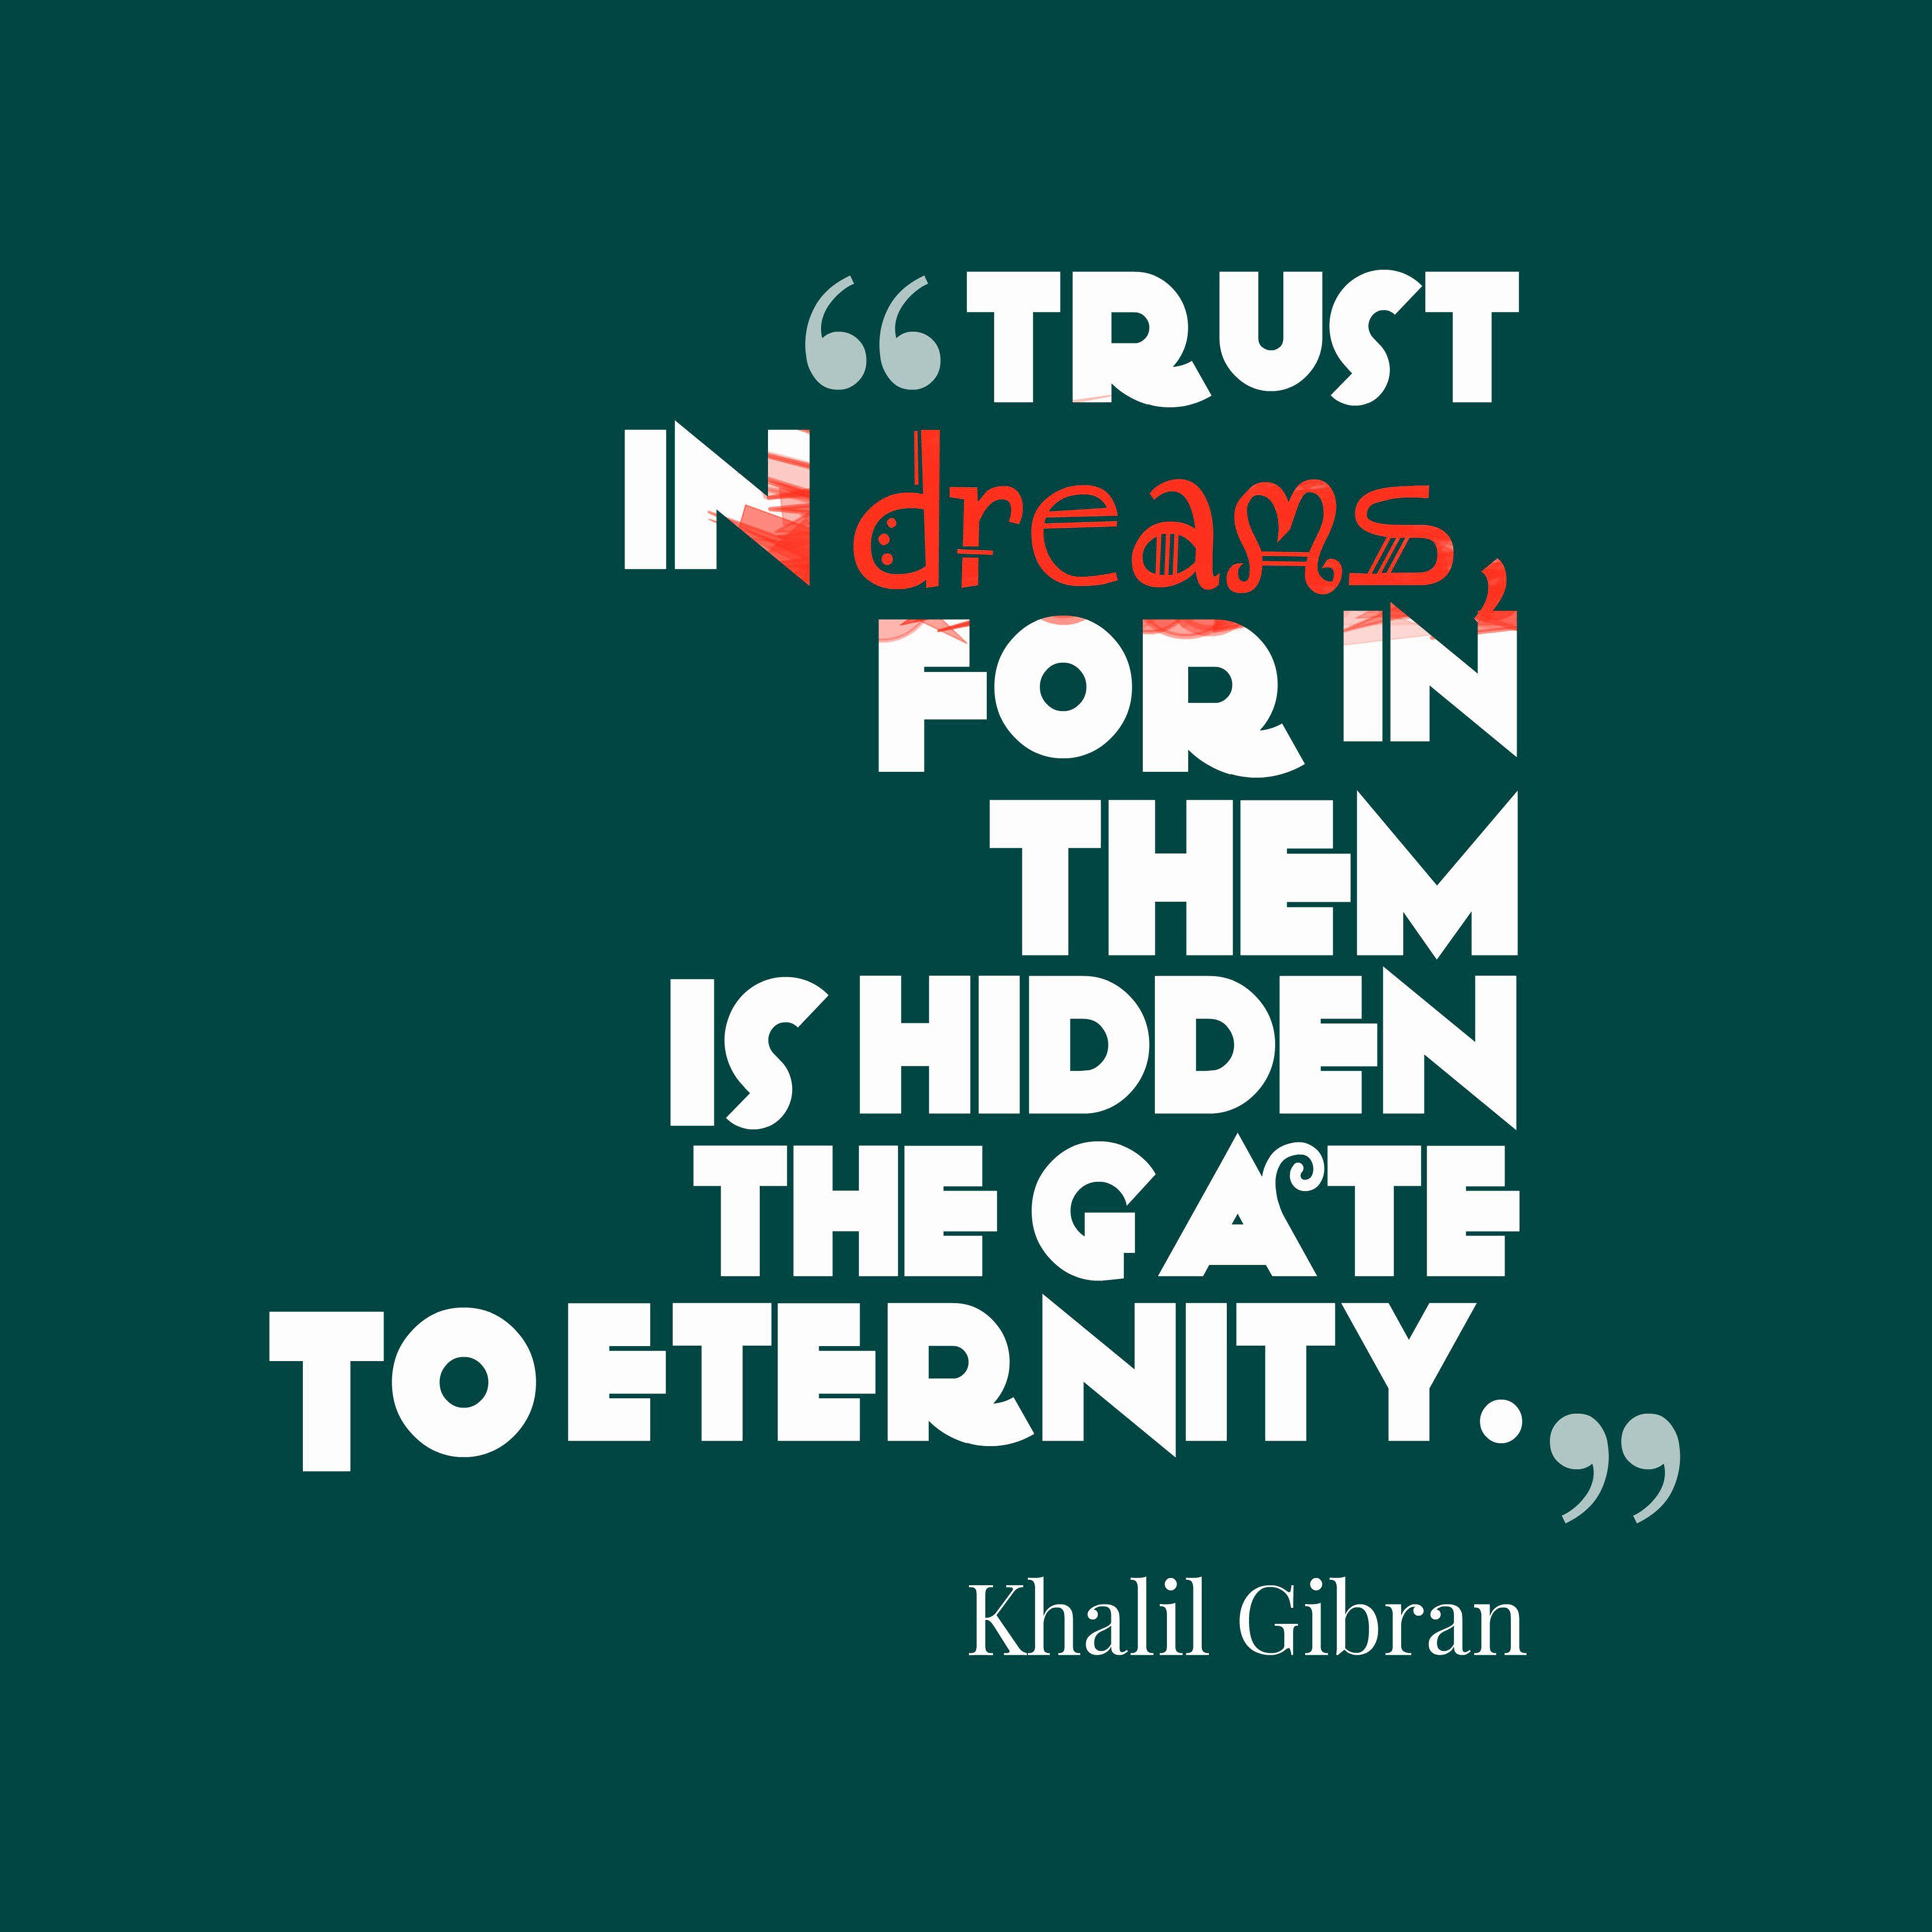 Hd wallpaper for whatsapp - Khalil Gibran Motivation Quotes In Hd Wallpaper For Whatsapp